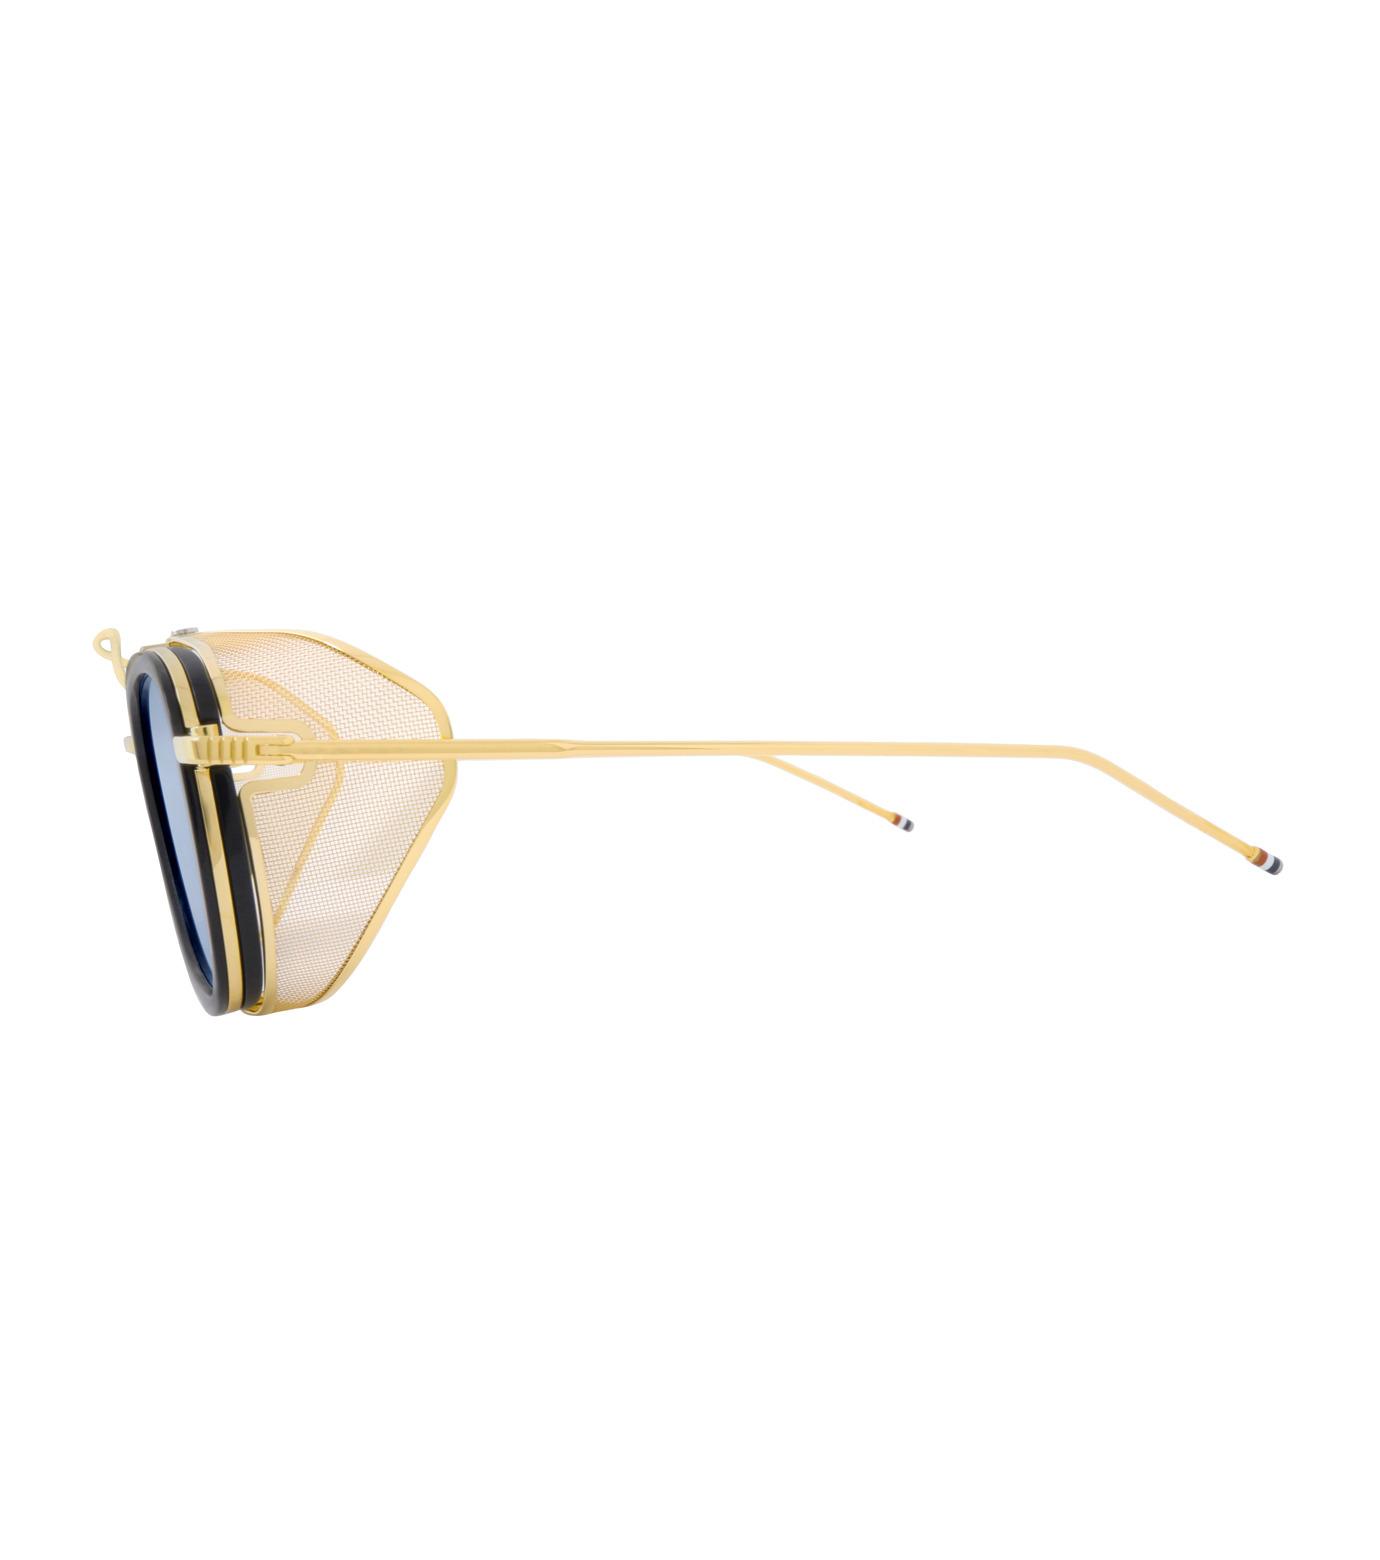 Thom Browne Eye Wear(トム・ブラウン・アイウェア)のSidemesh Sunglass-NAVY(アイウェア/eyewear)-TB-808-C-93 拡大詳細画像2